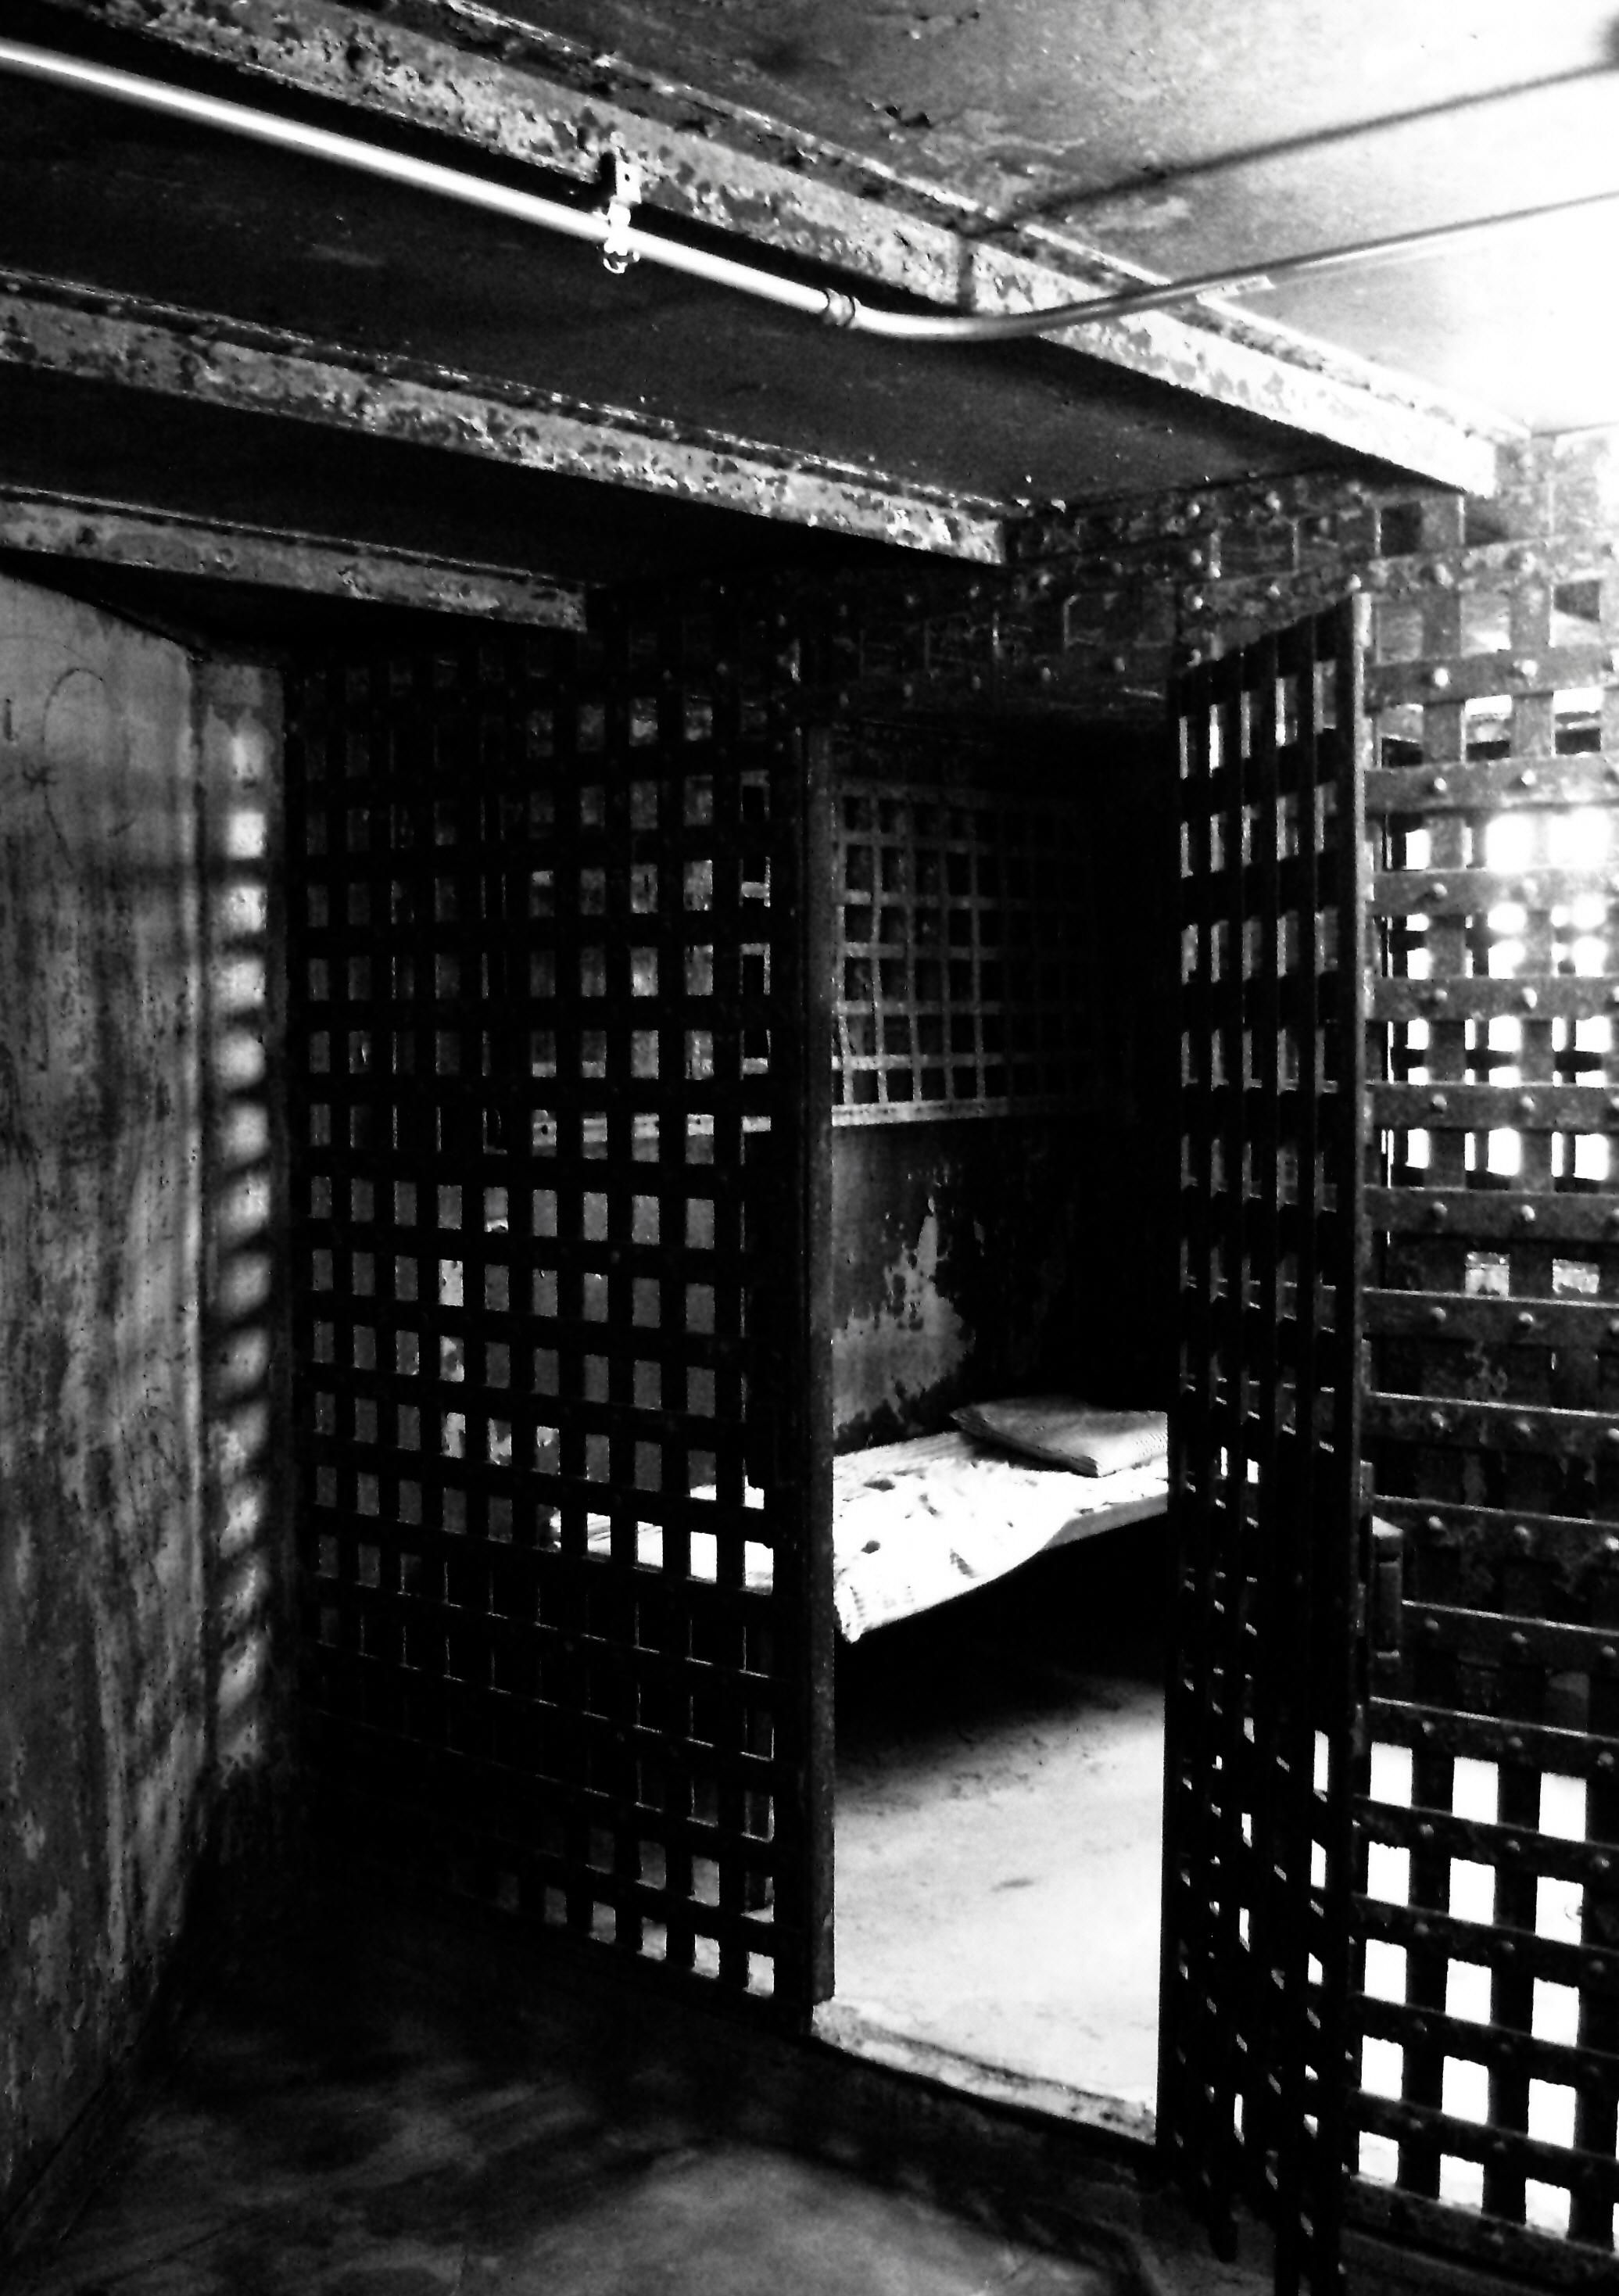 File:Austin County Jail Museum (4323064927) jpg - Wikimedia Commons